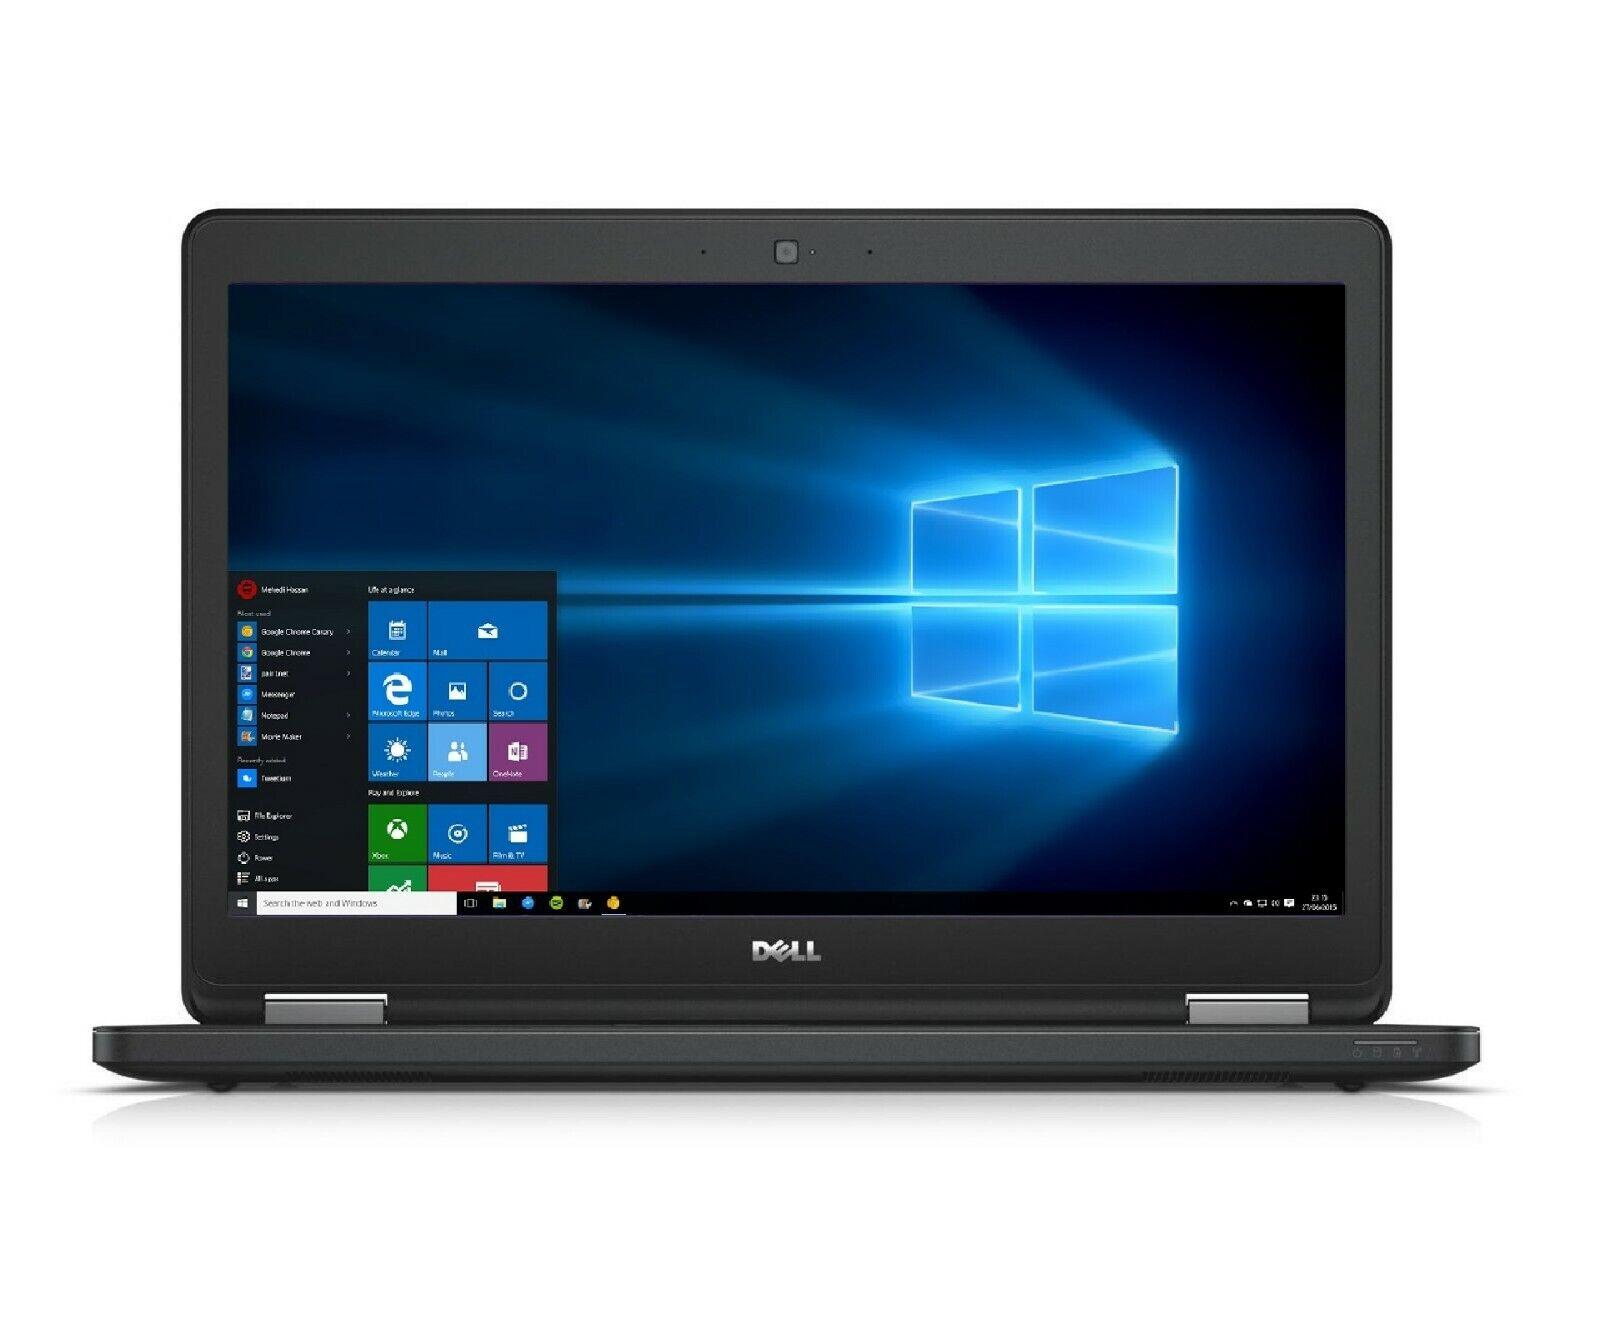 Laptop Windows - Dell Latitude Business Gaming Laptop 15.6 inch HD Intel Core i5 16GB RAM 2TB SSD